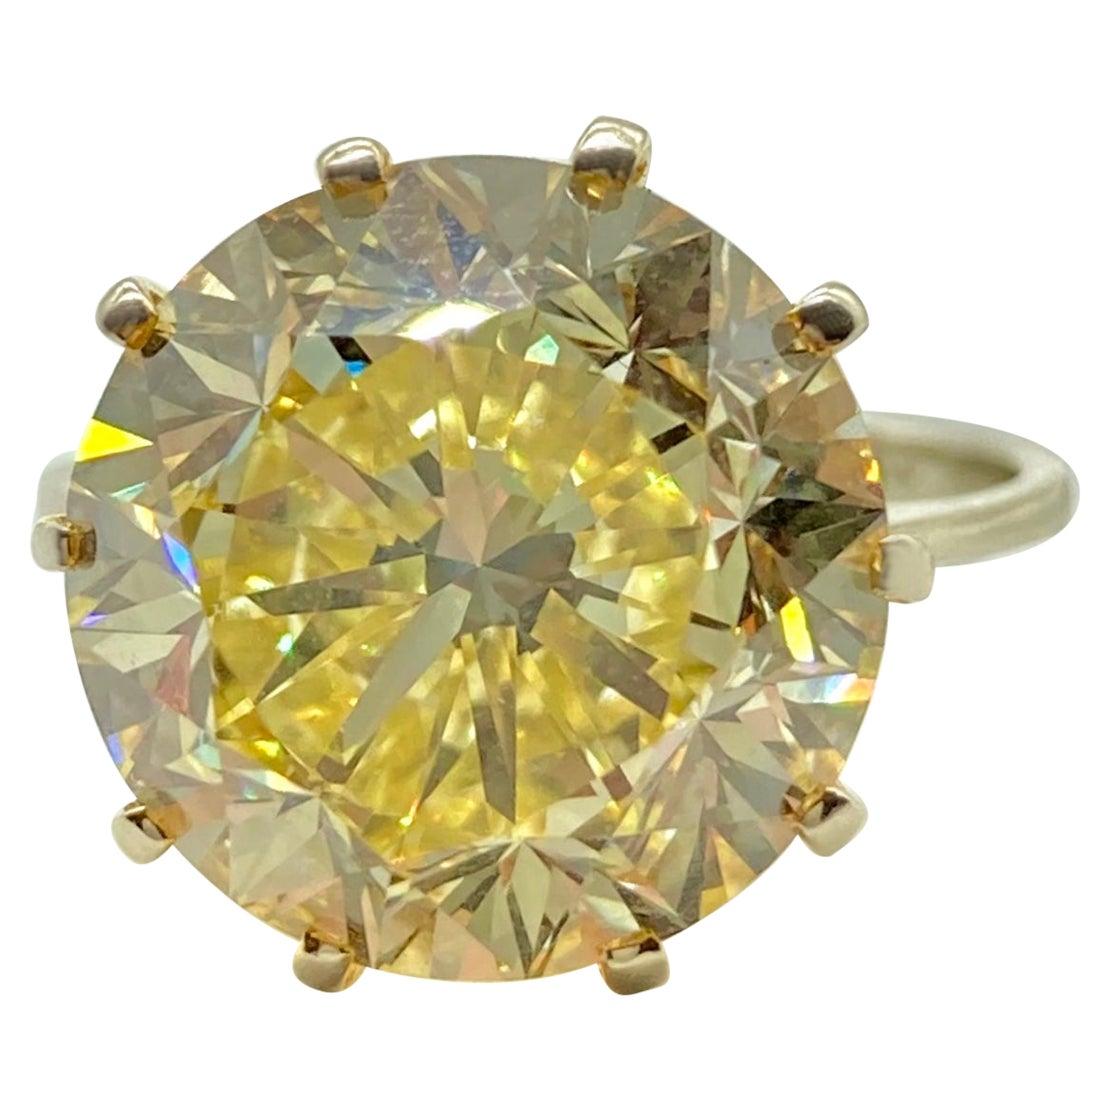 GIA Certified 7.41 Carat Fancy Intense Yellow Diamond Solitaire Ring